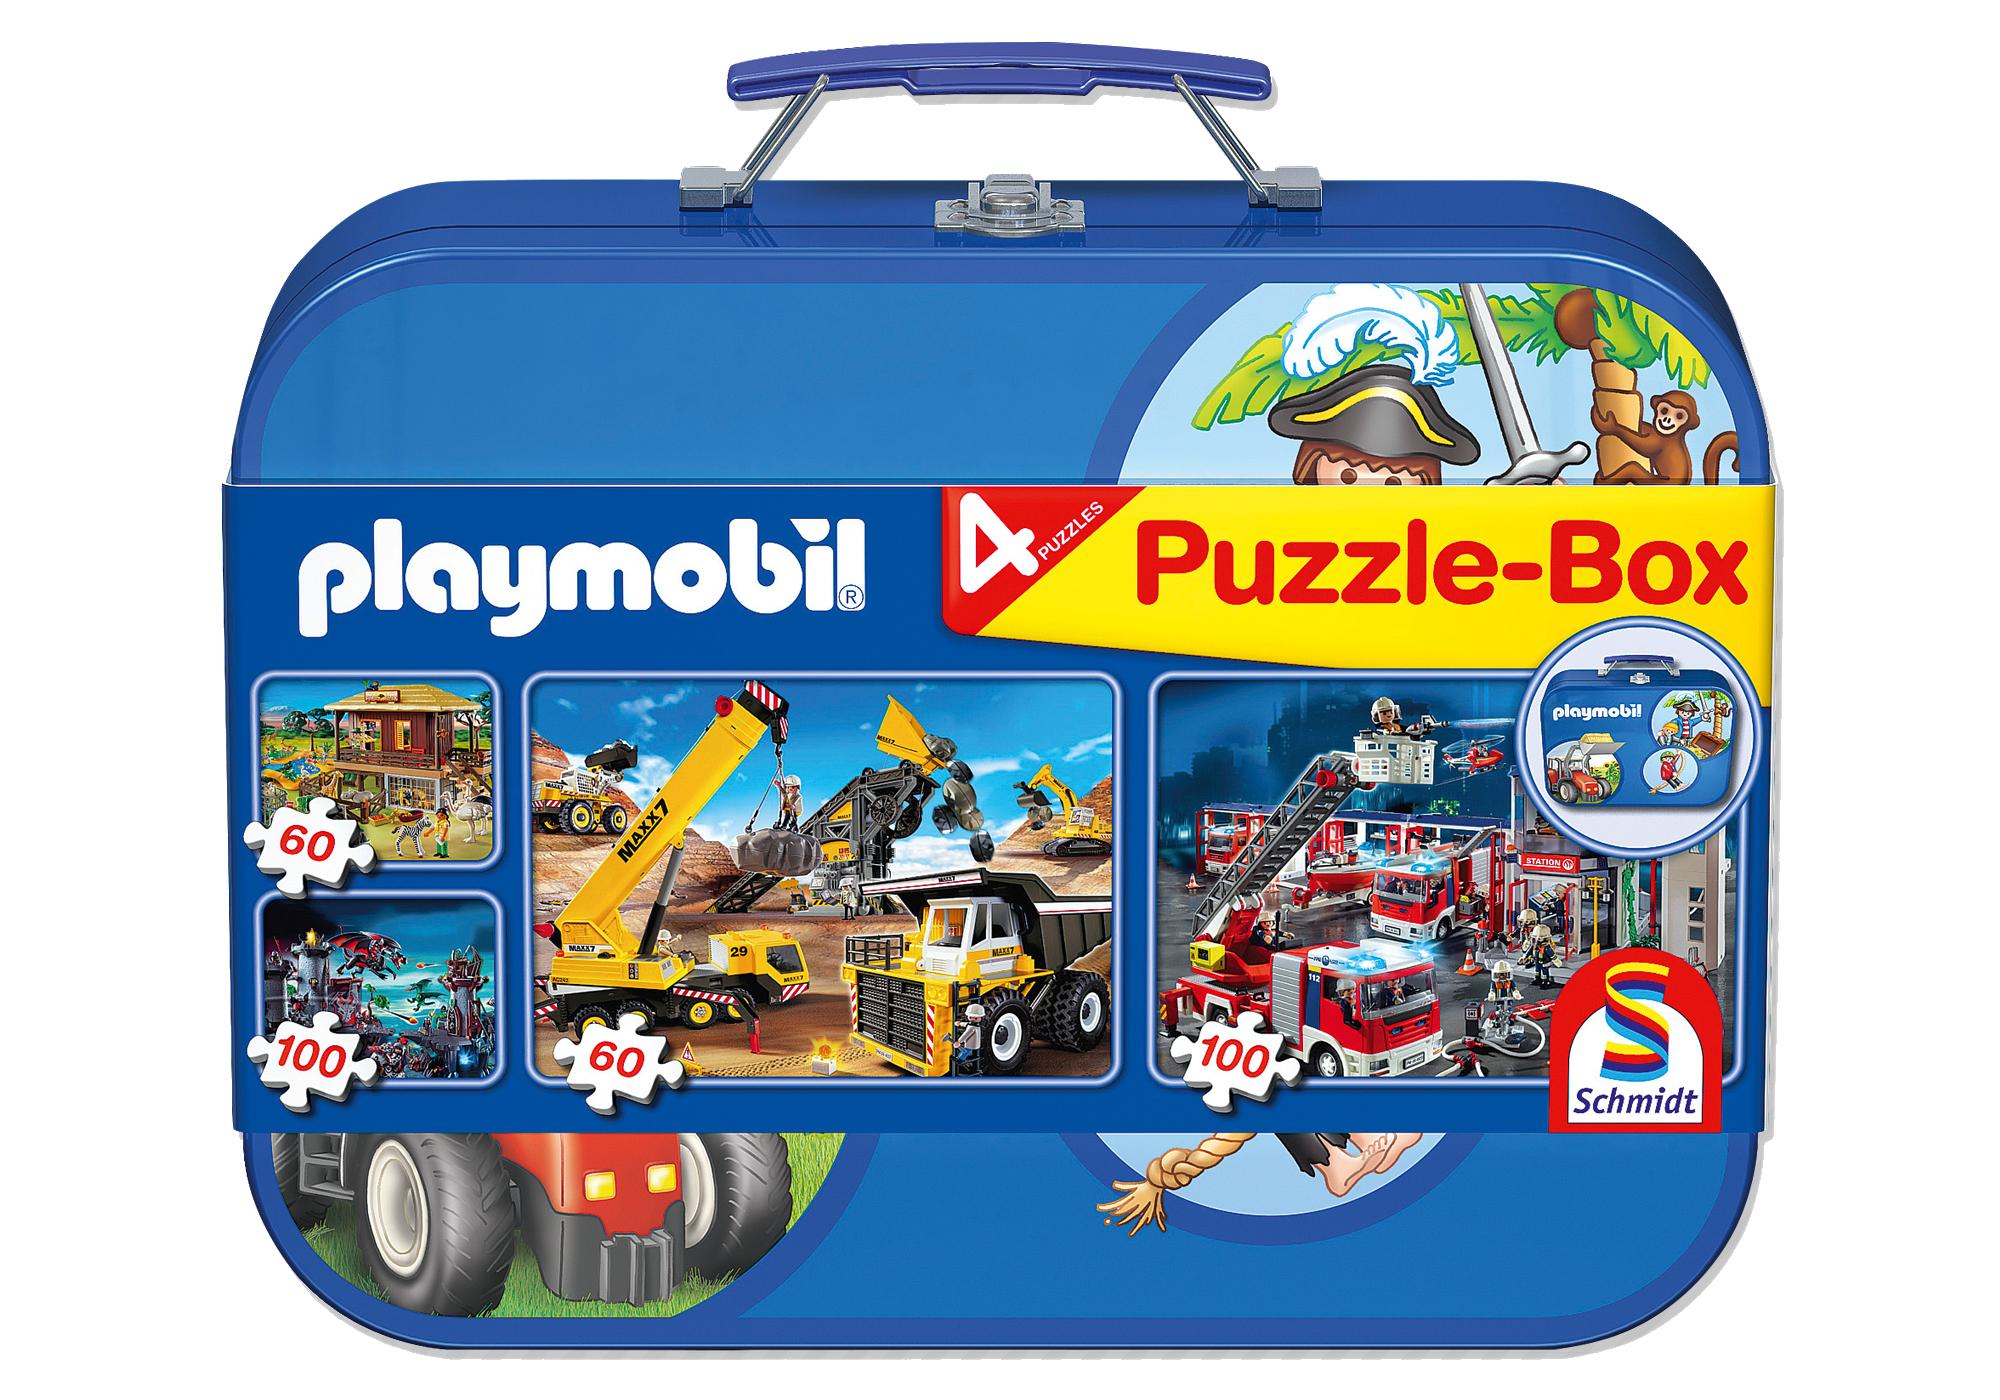 http://media.playmobil.com/i/playmobil/80247_product_detail/Puzzle-Box